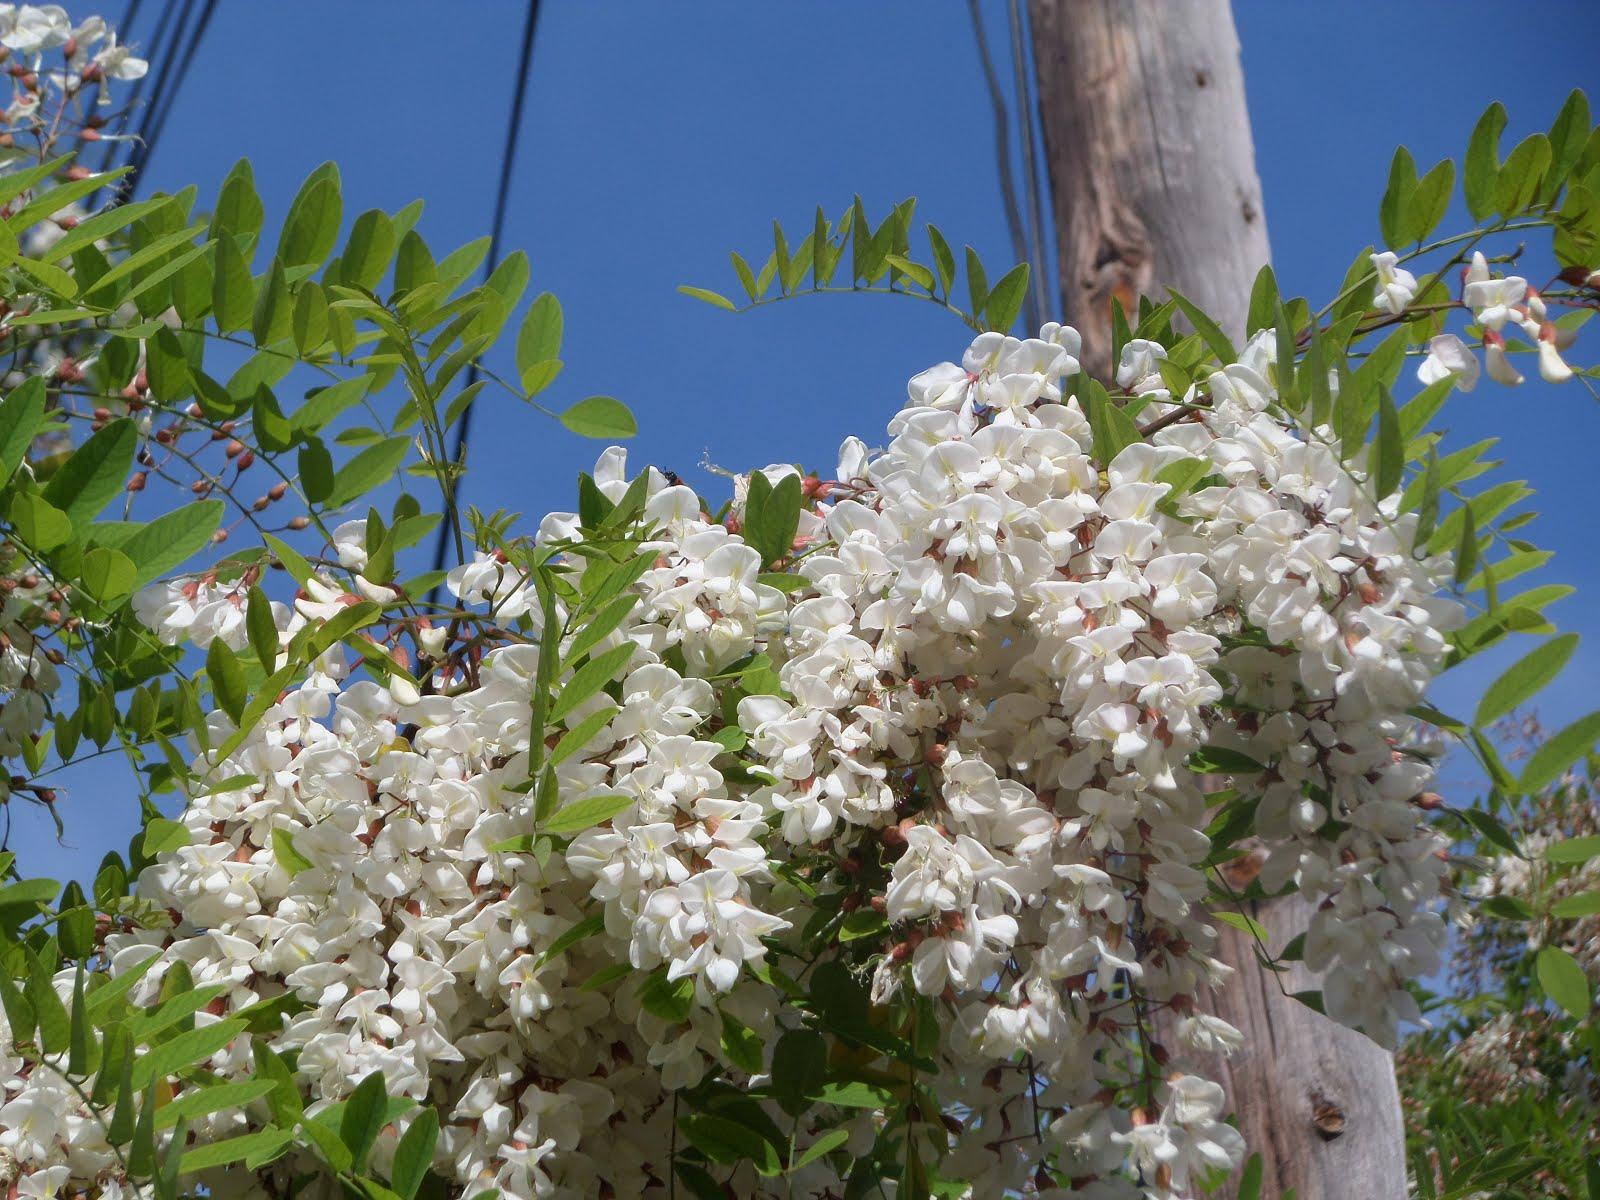 Flors blanques